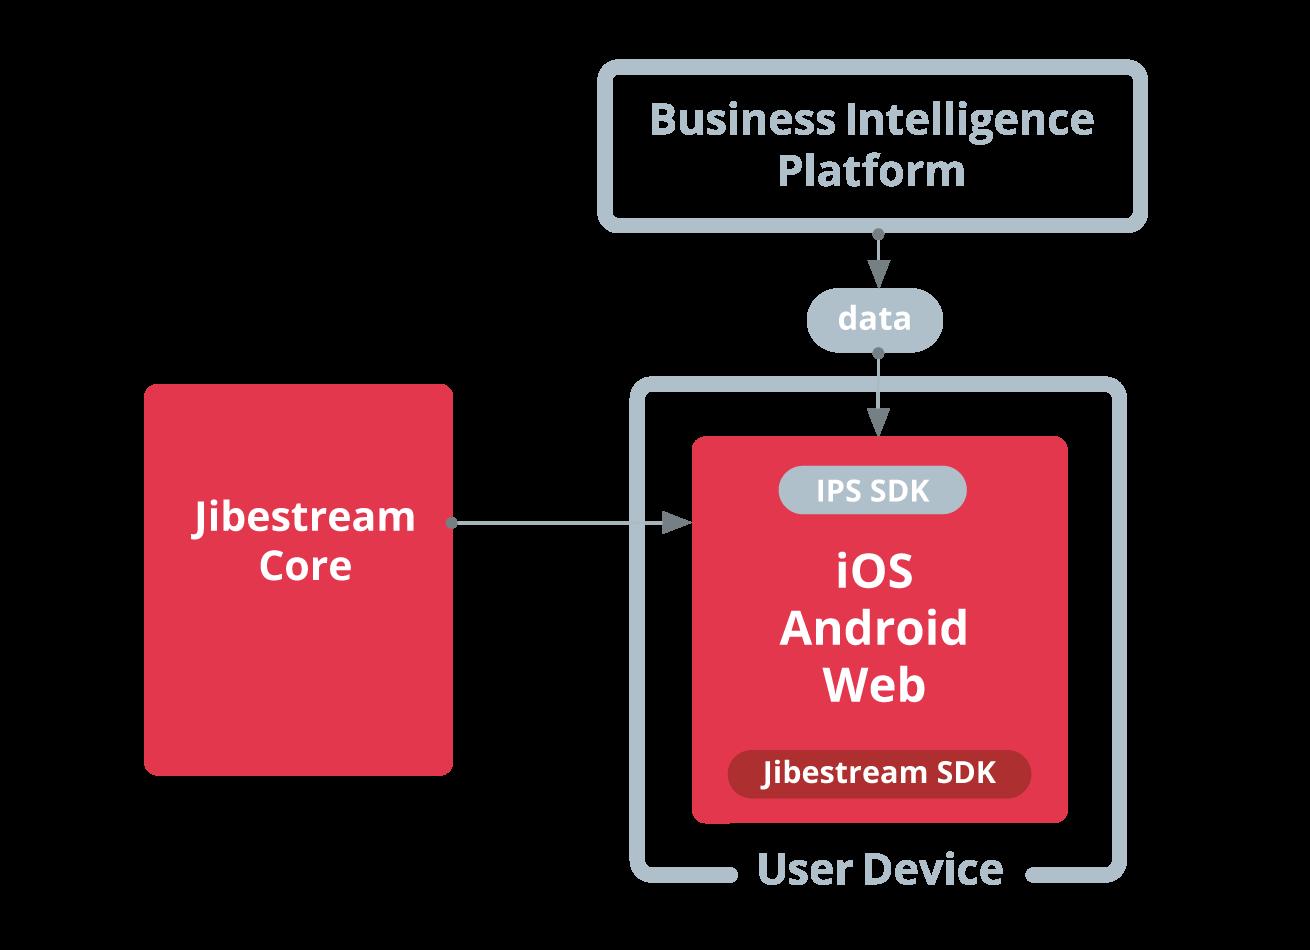 Jibestream Use Case - Spatial Business Intelligence